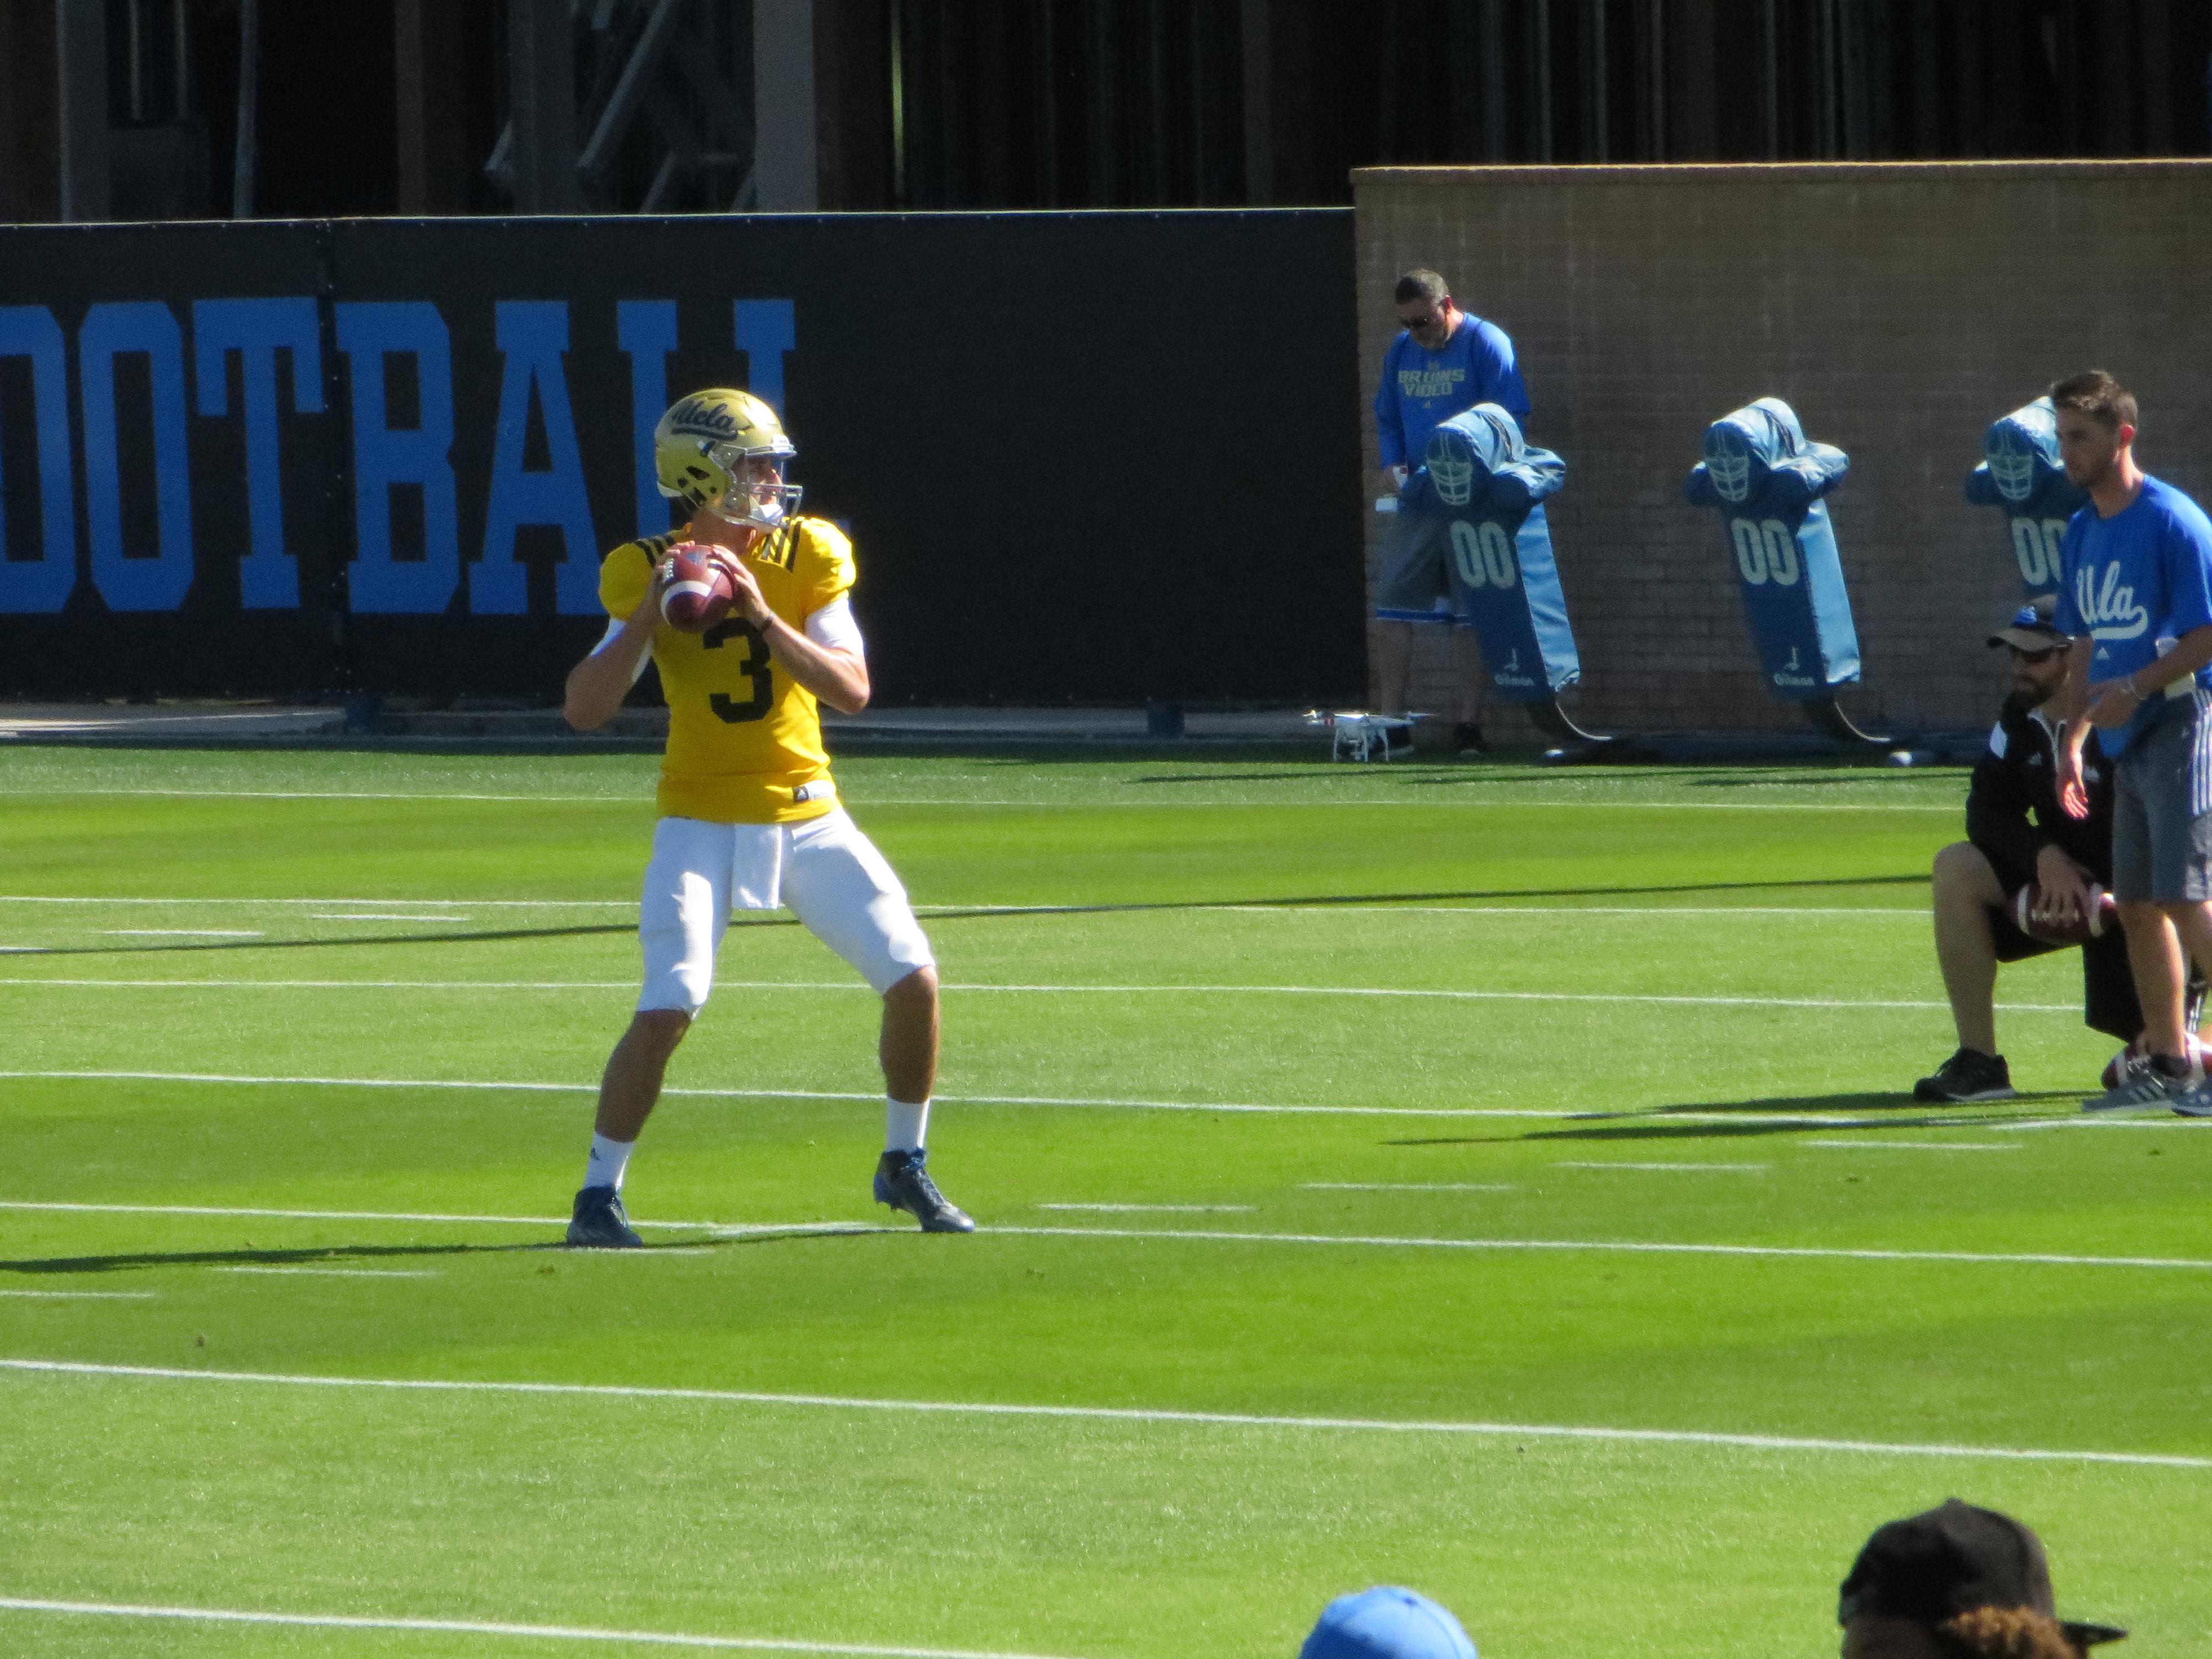 The focus falls on the freshman quarterback now.